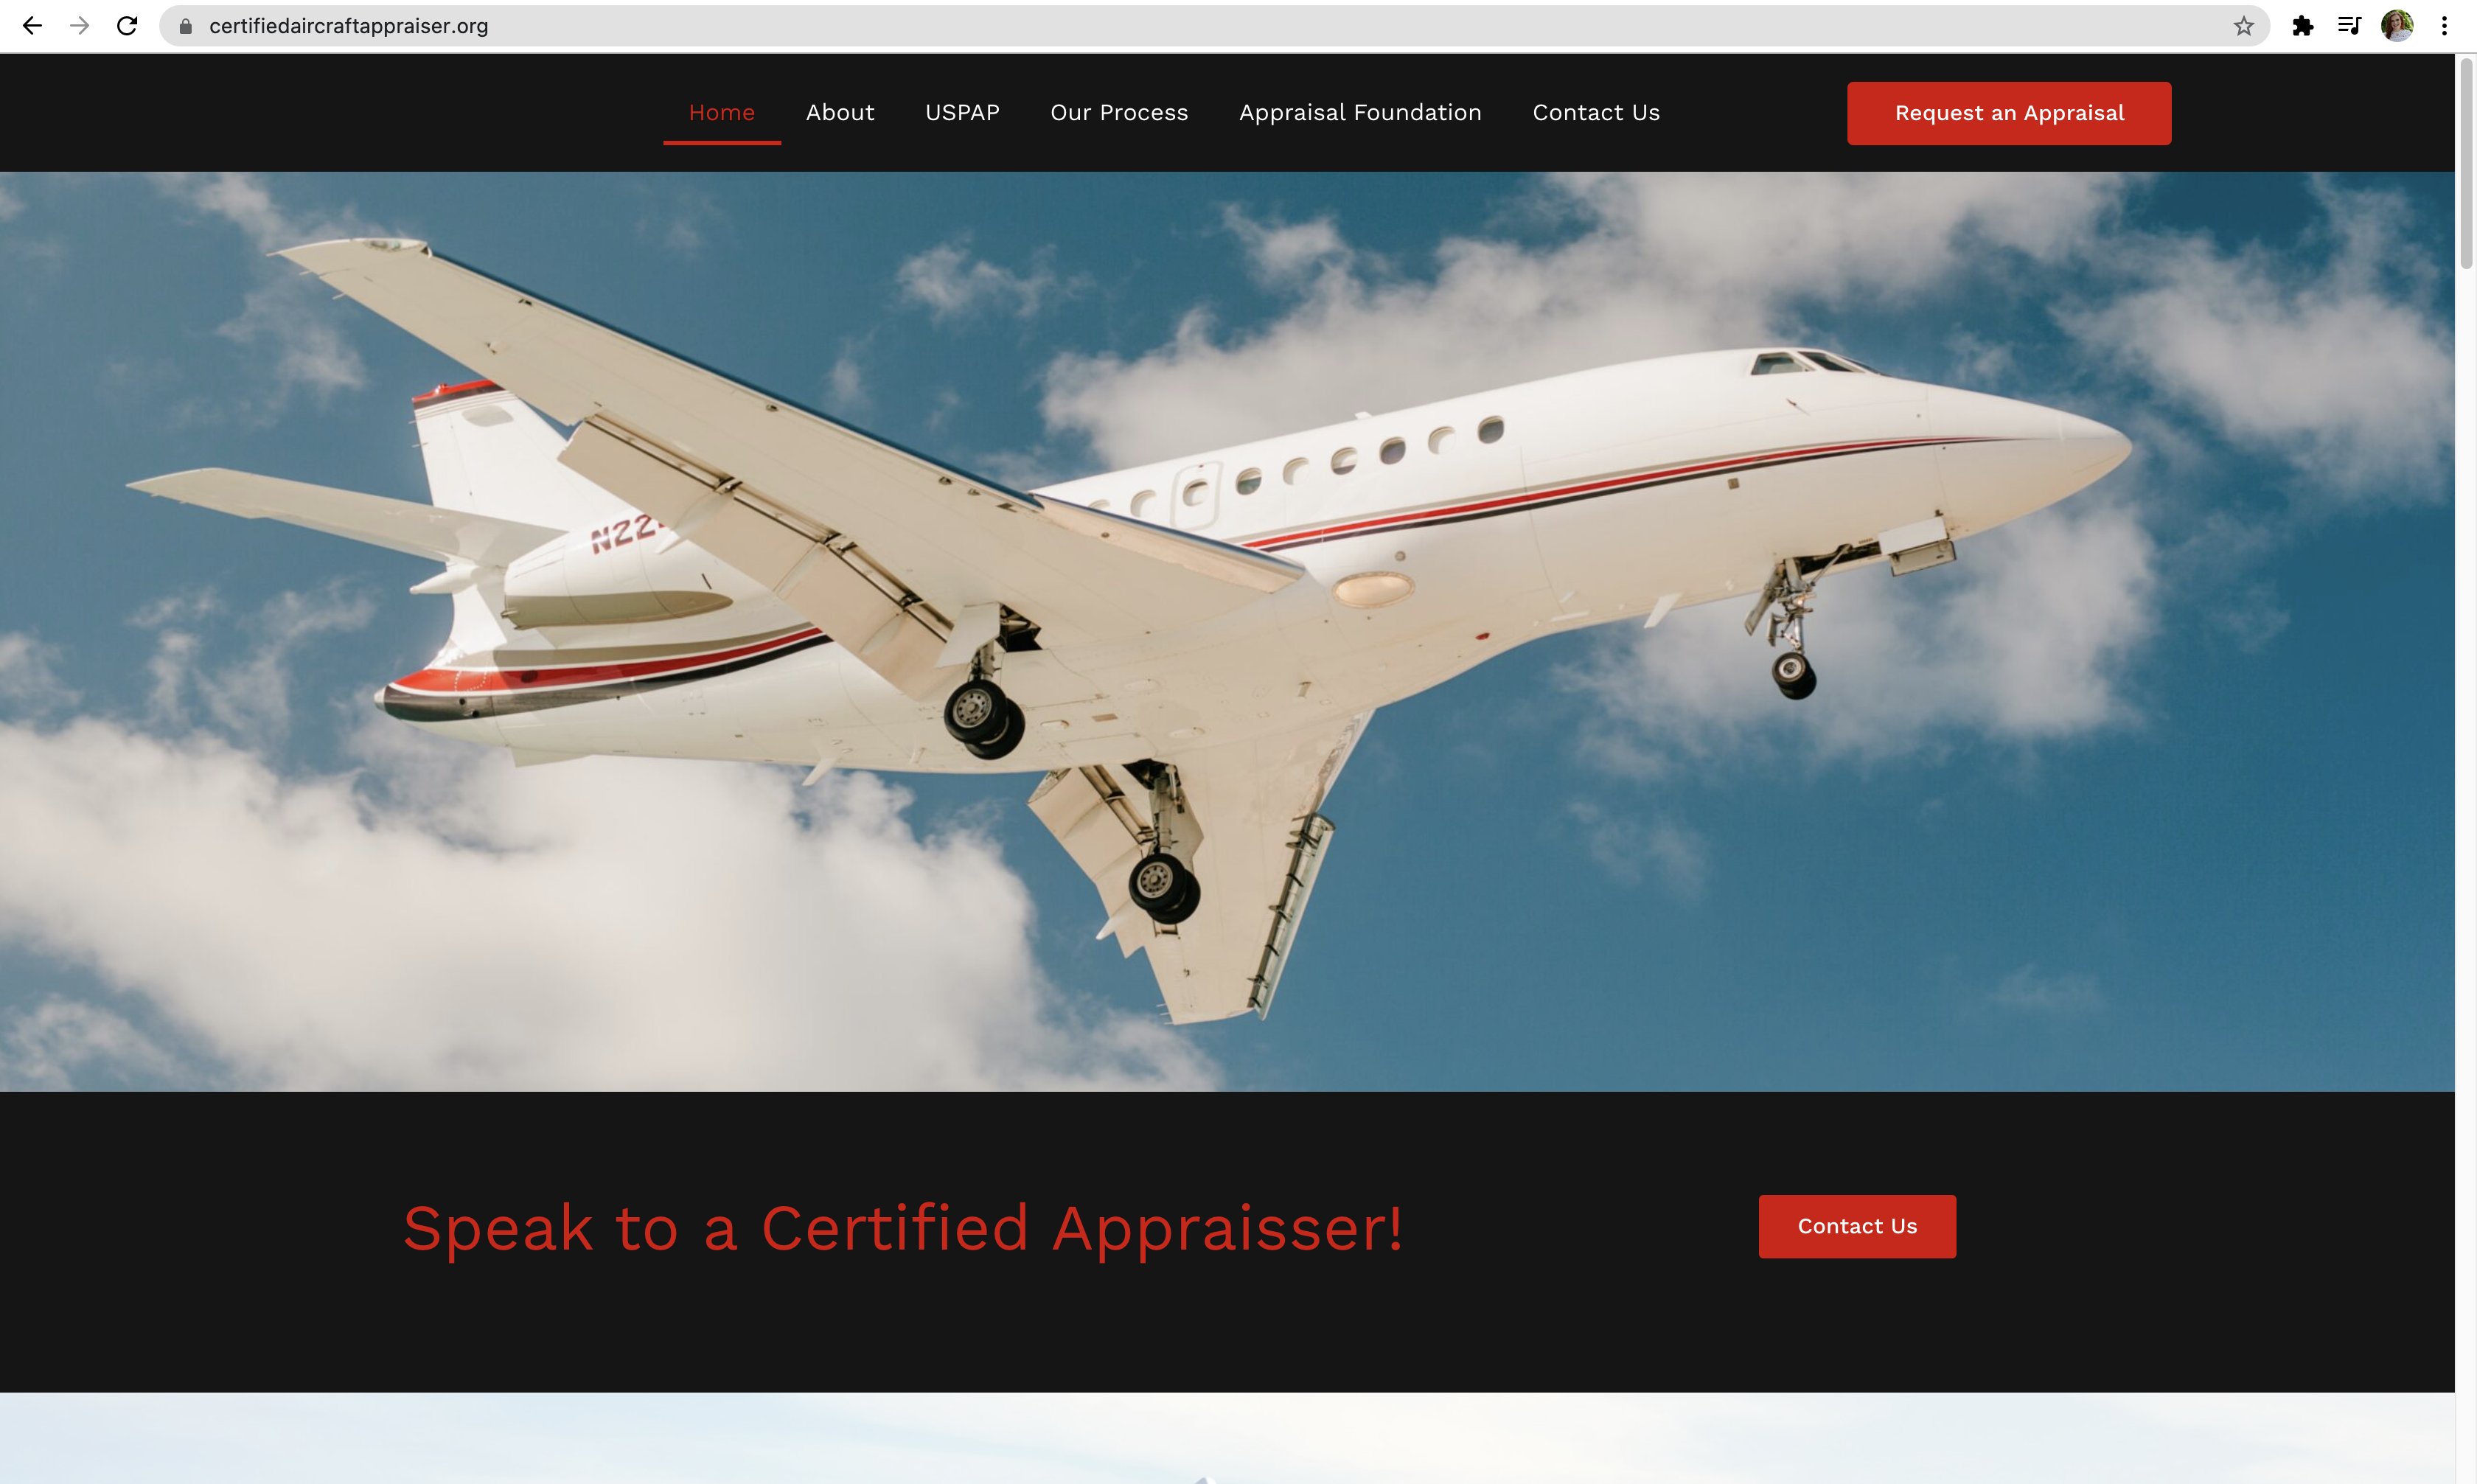 CAAA - Certified Aircraft Appraisers - Digital Marketing